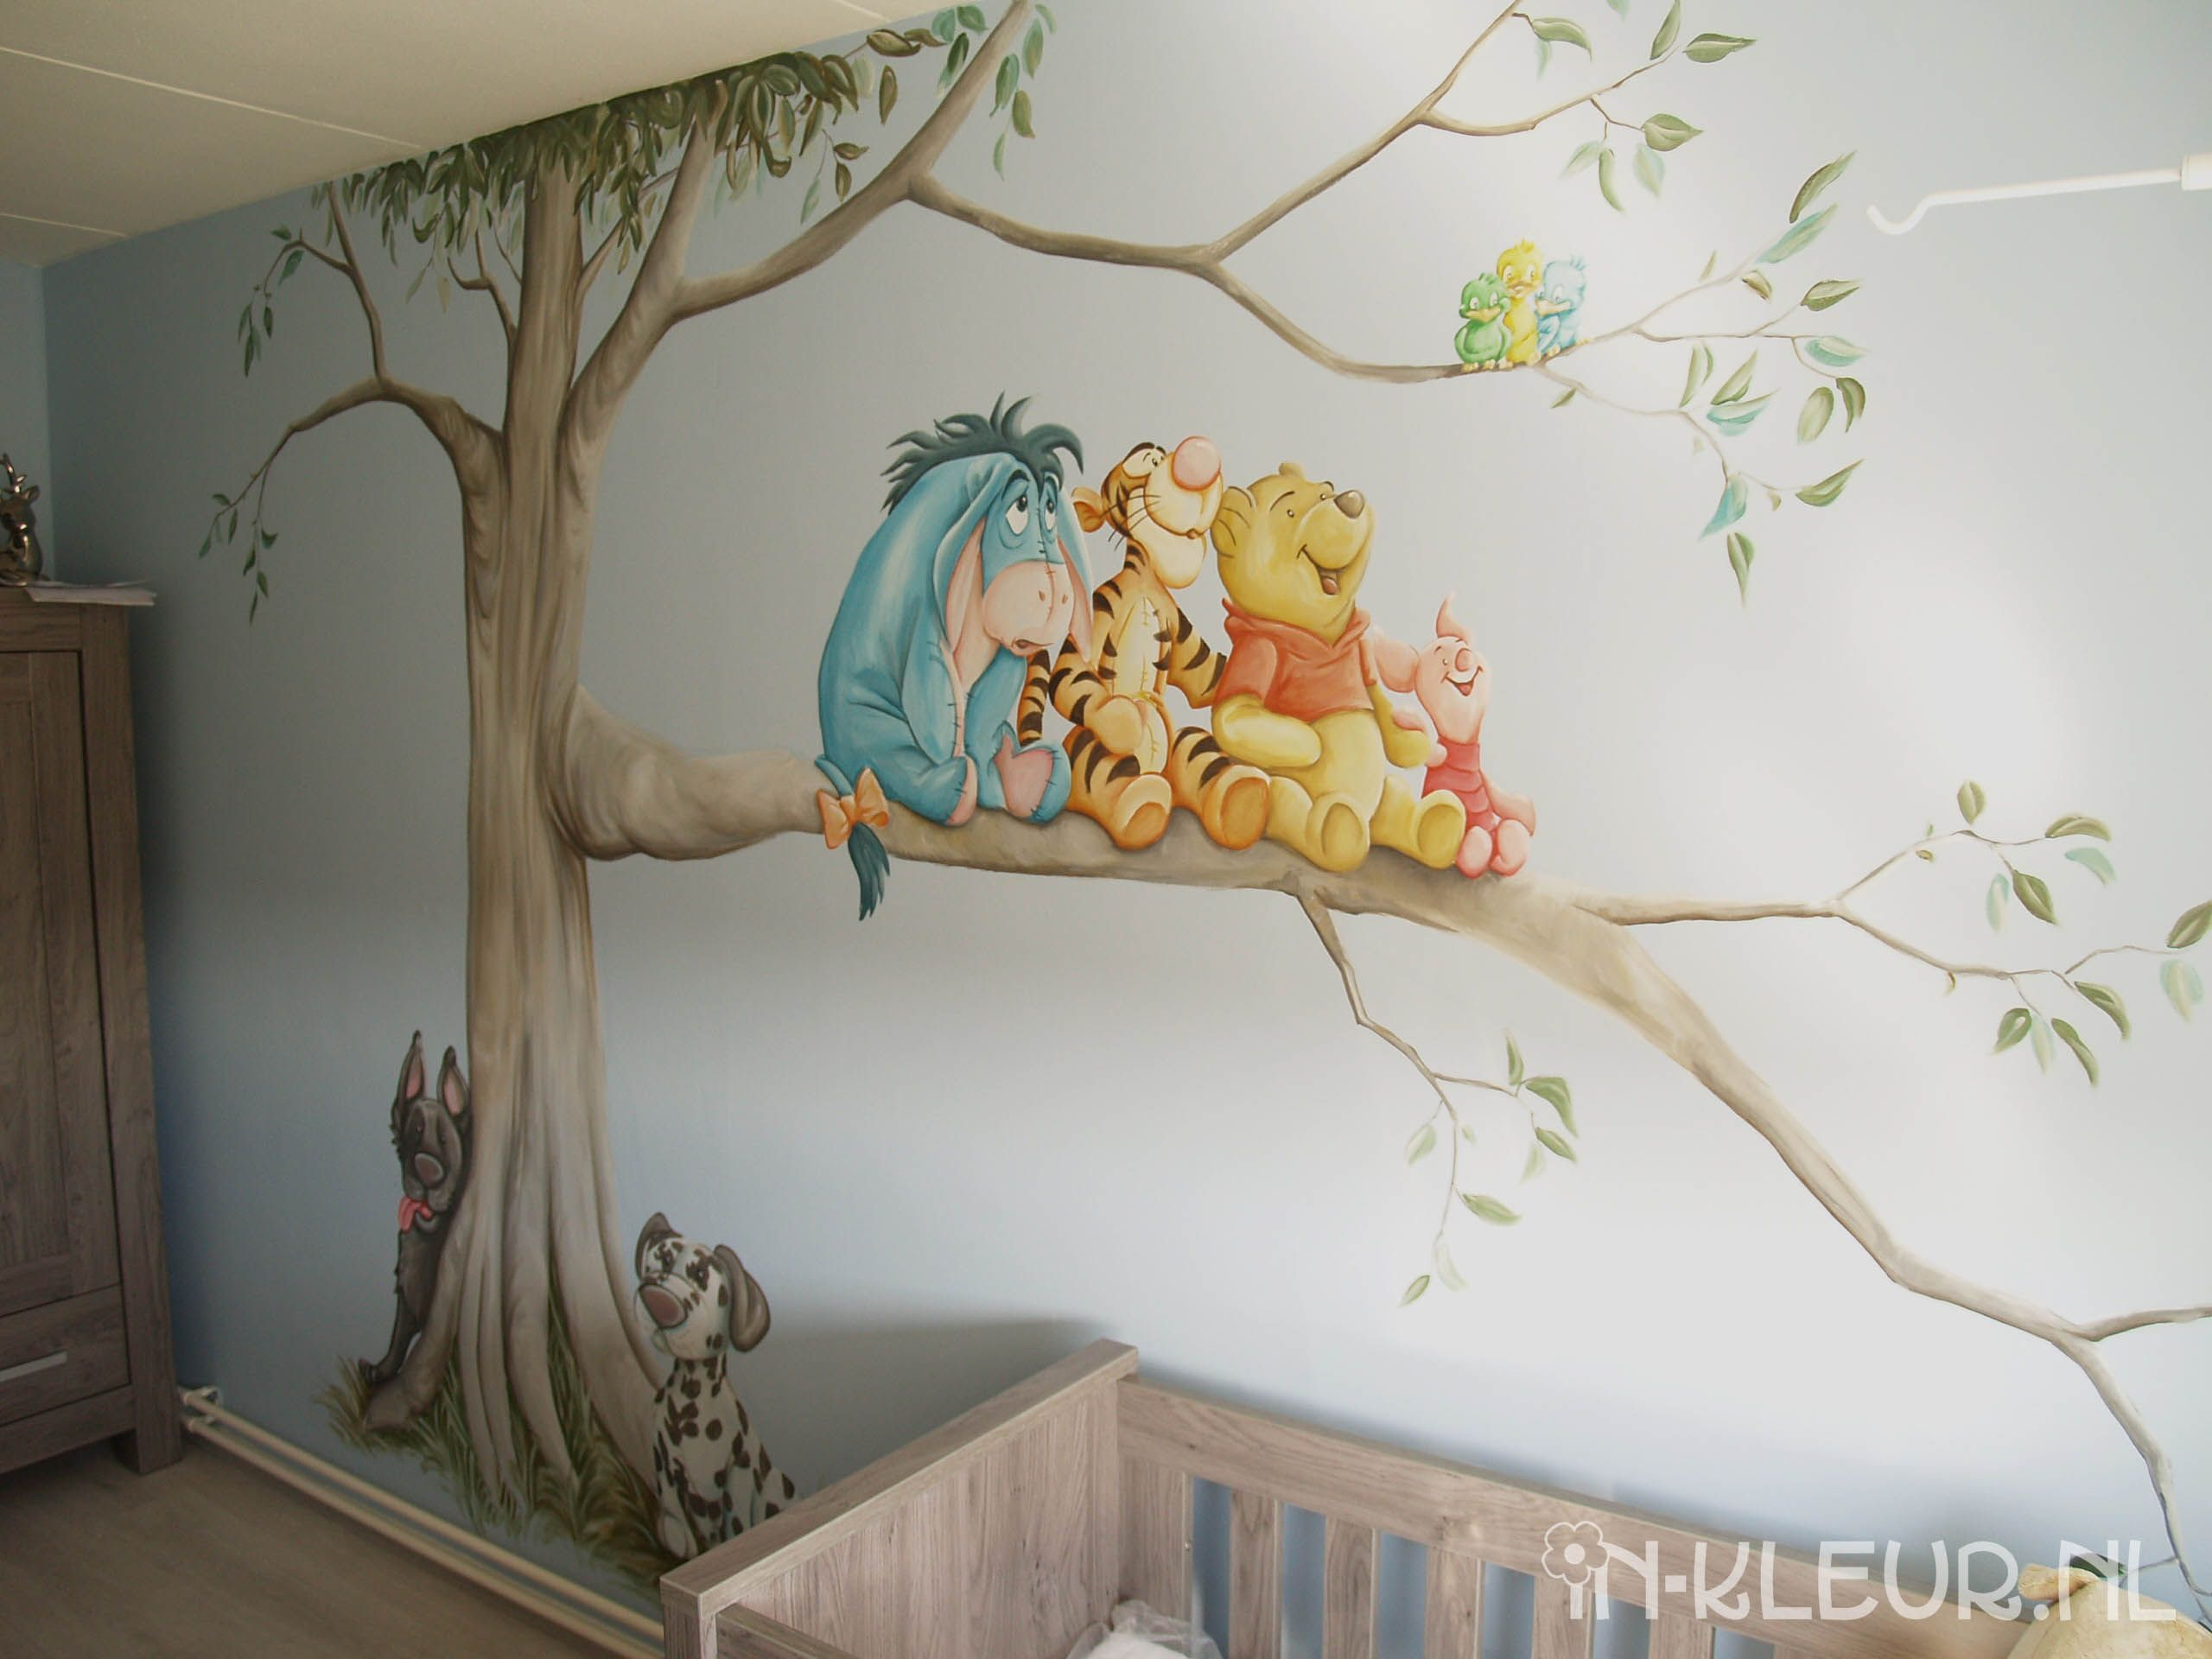 Poeh Muurschildering Babykamer Boom Hondjes Wandgemalde Ideen